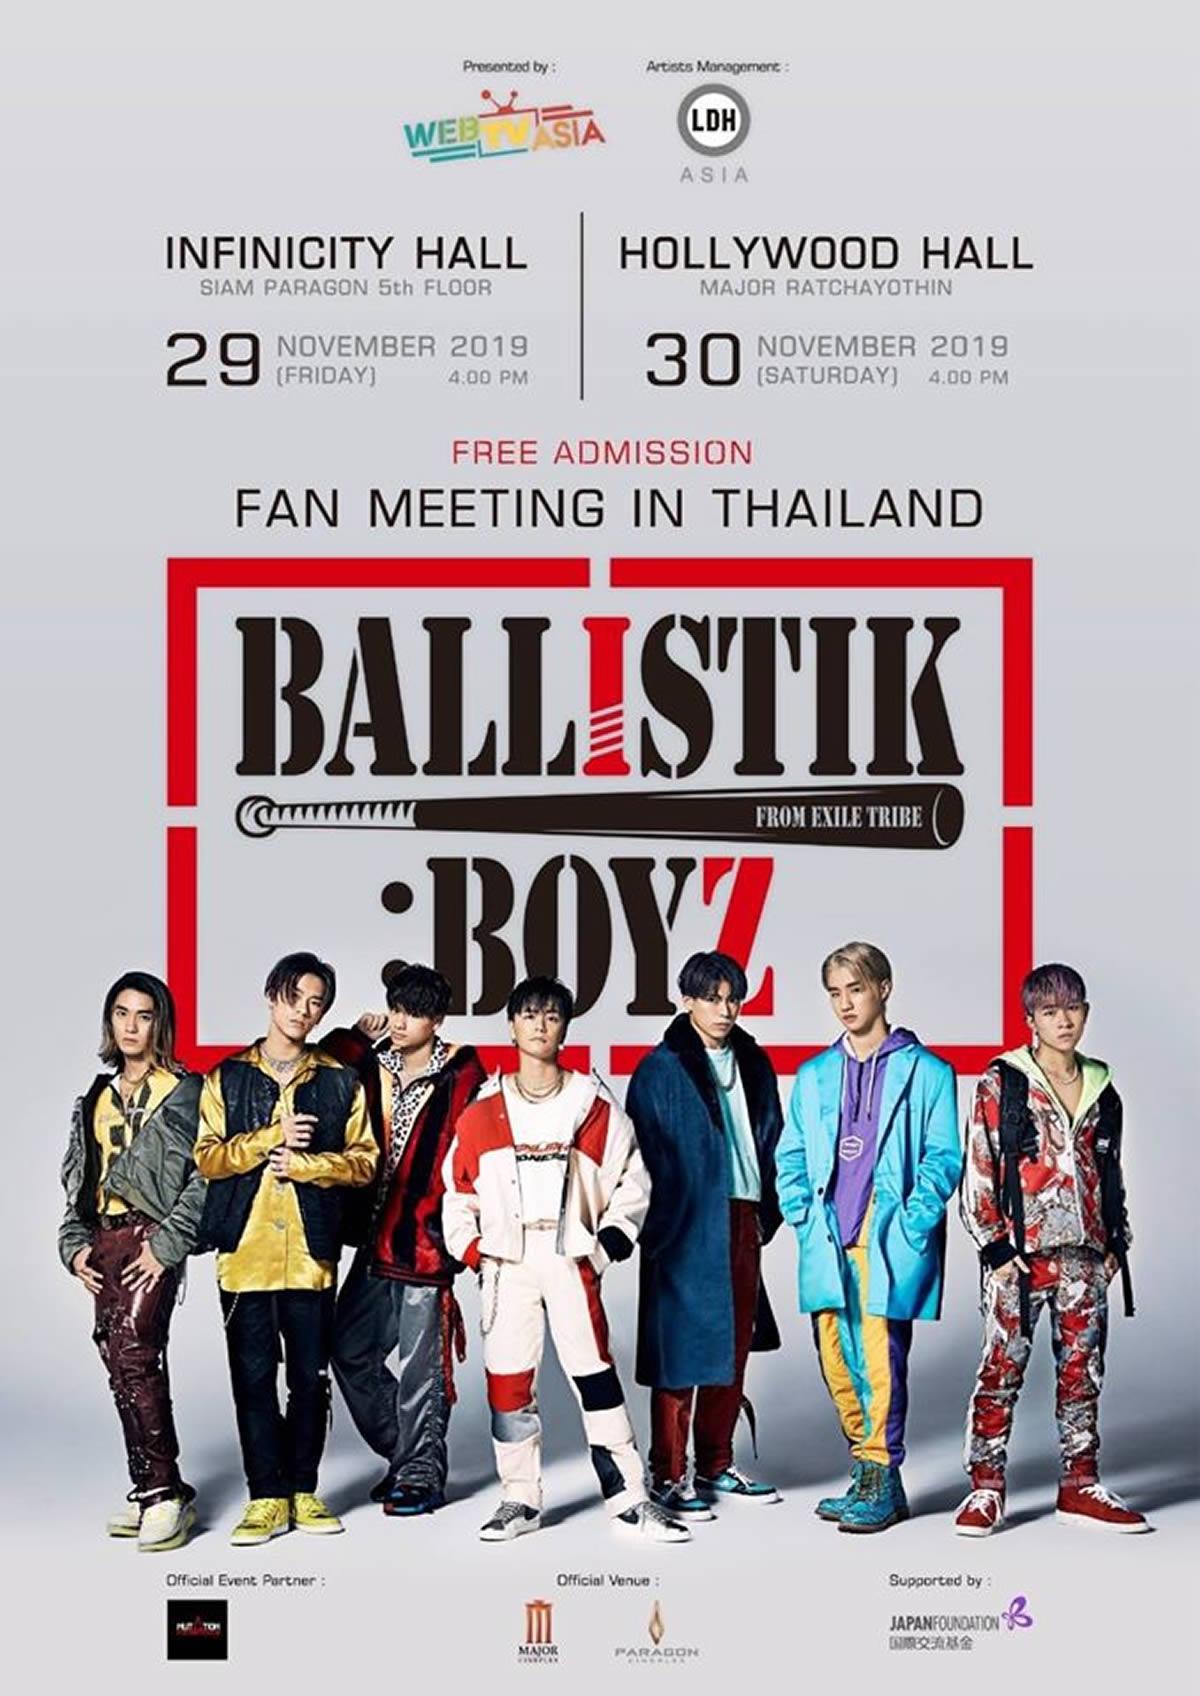 BALLISTIK BOYZがタイ・バンコクで無料ファンミ開催、2019年11月29日・30日